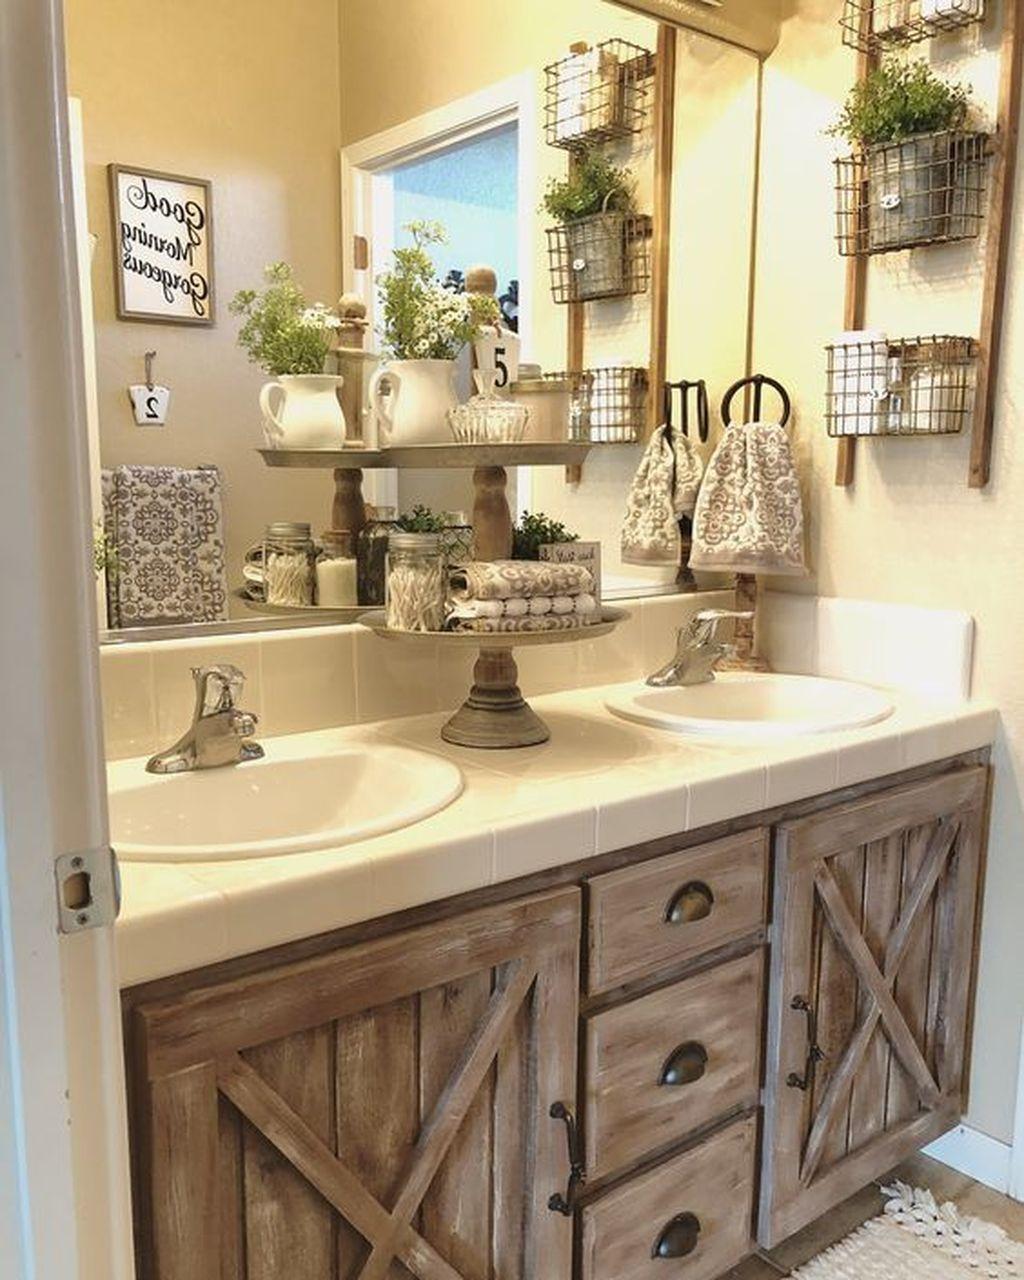 80 Small Farmhouse Bathroom Decor Ideas In 2020 Beautiful Bathroom Decor